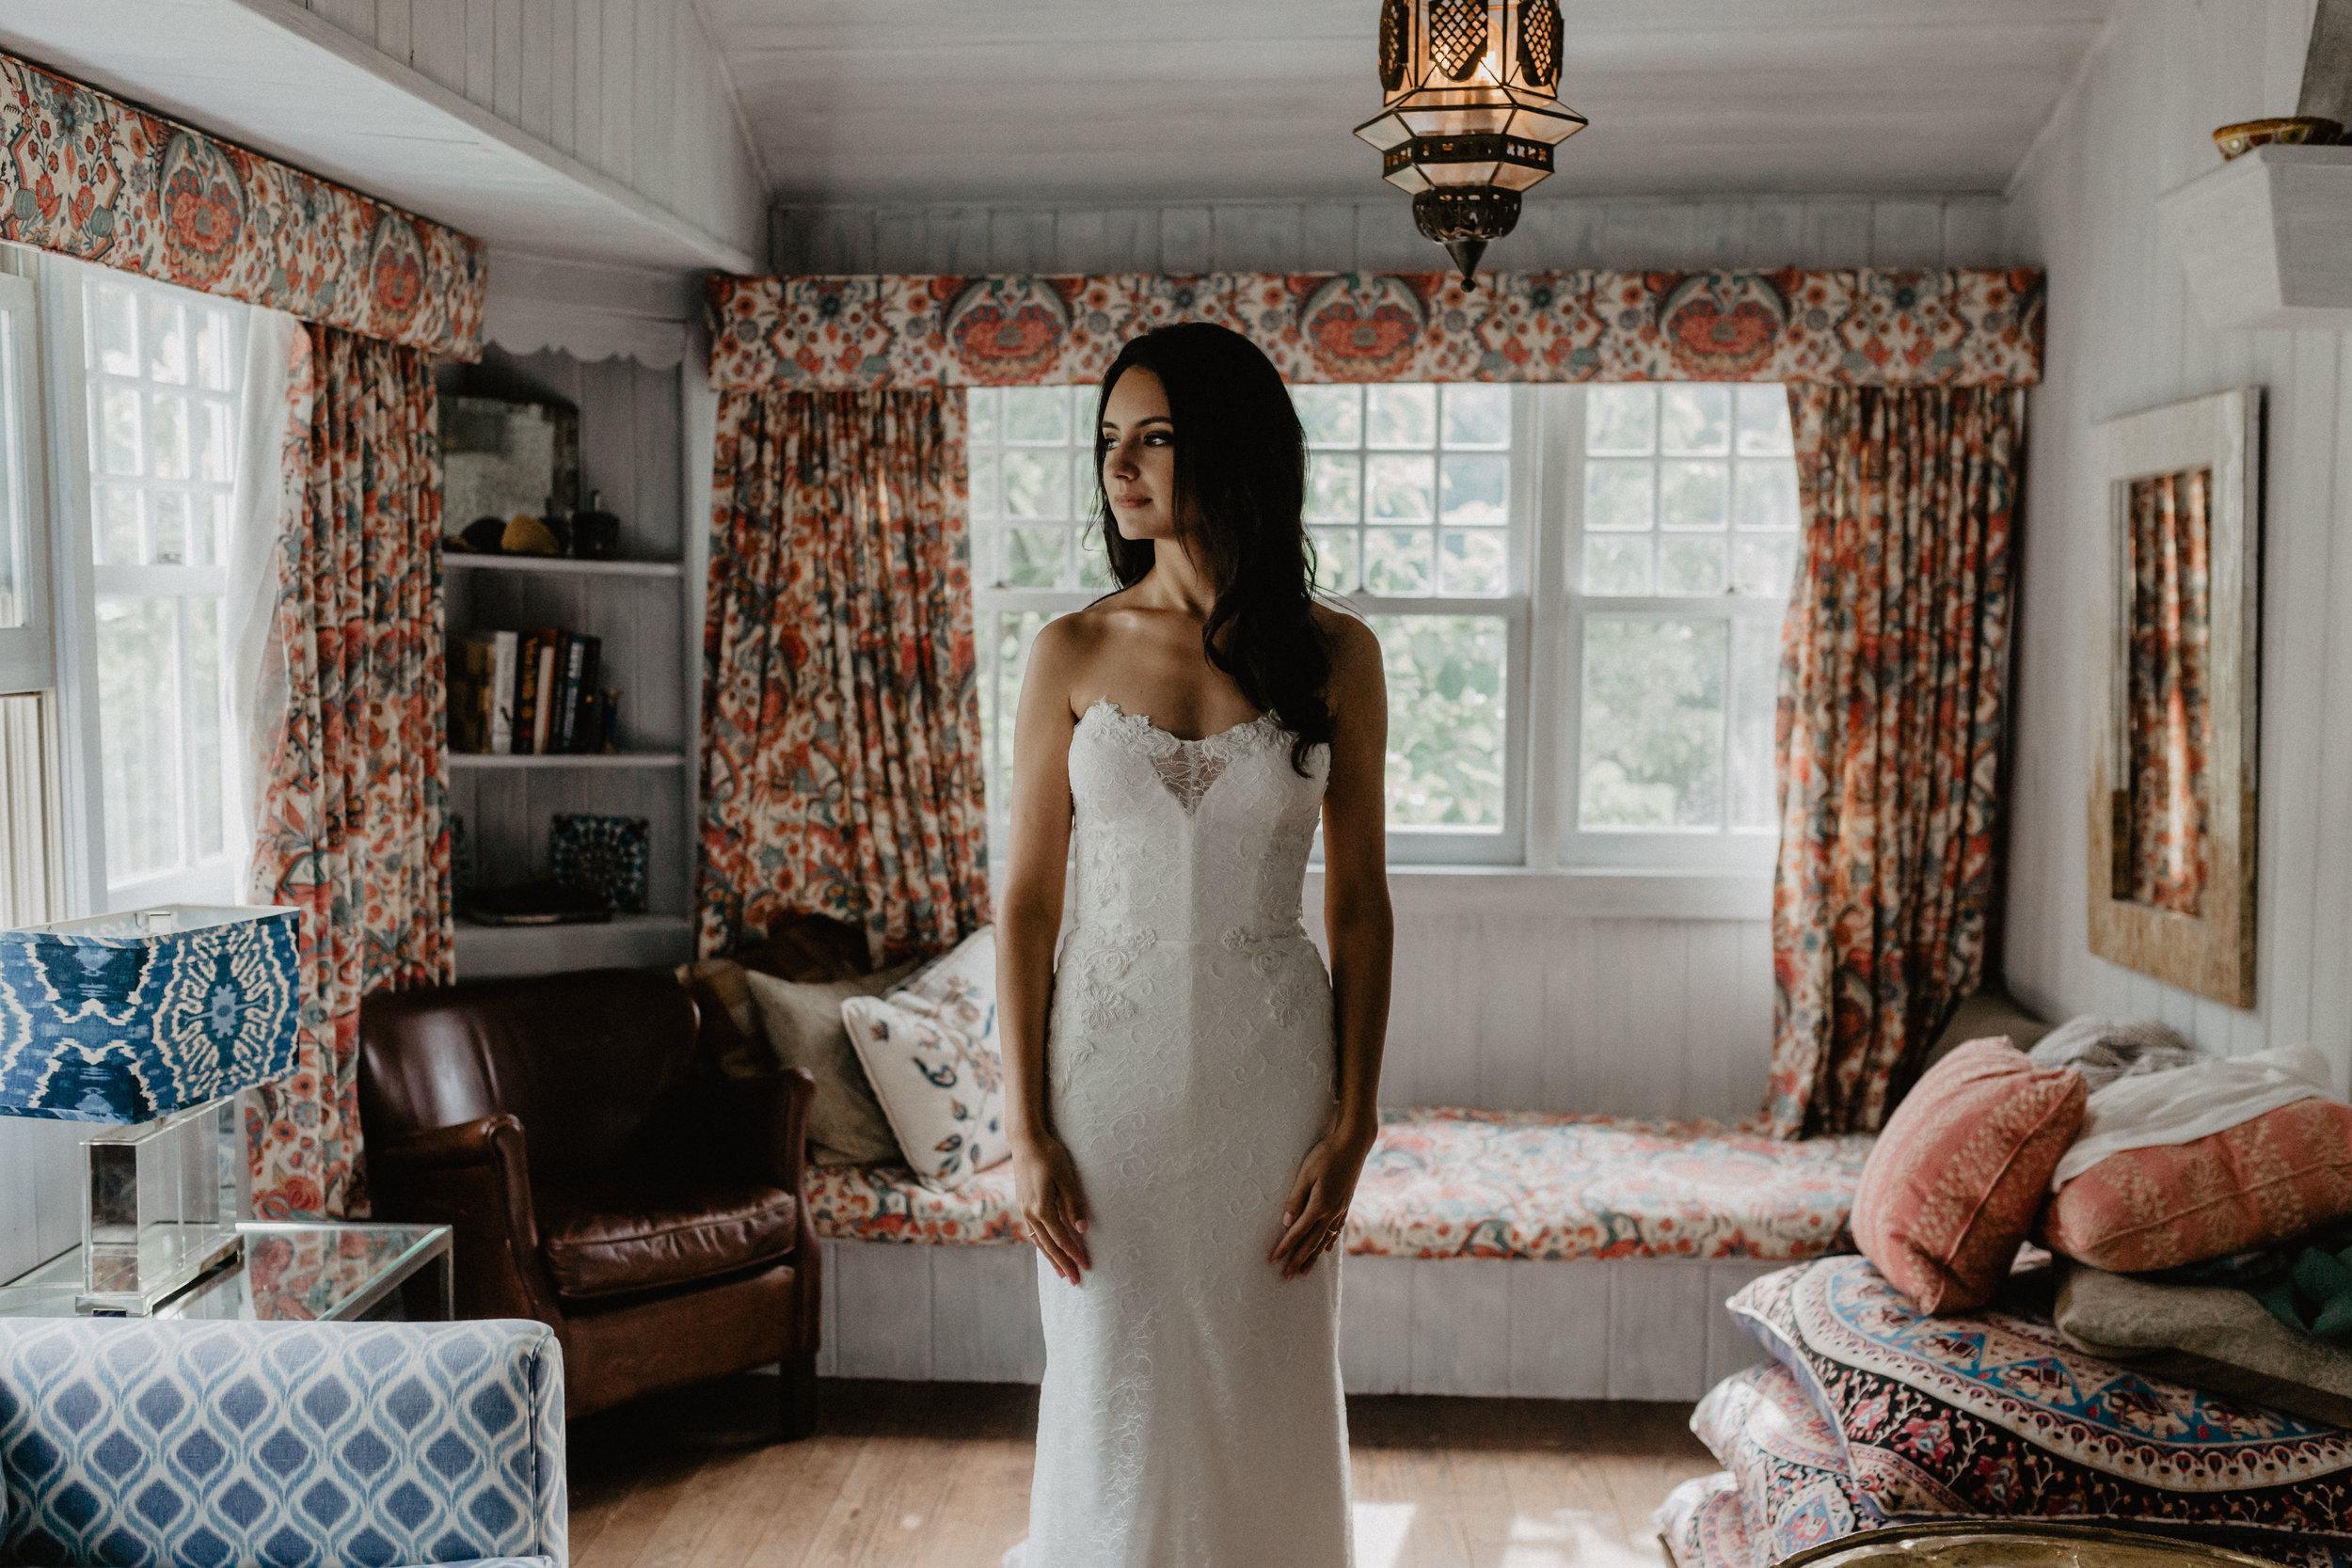 deer_mountain_inn_wedding_030.jpg